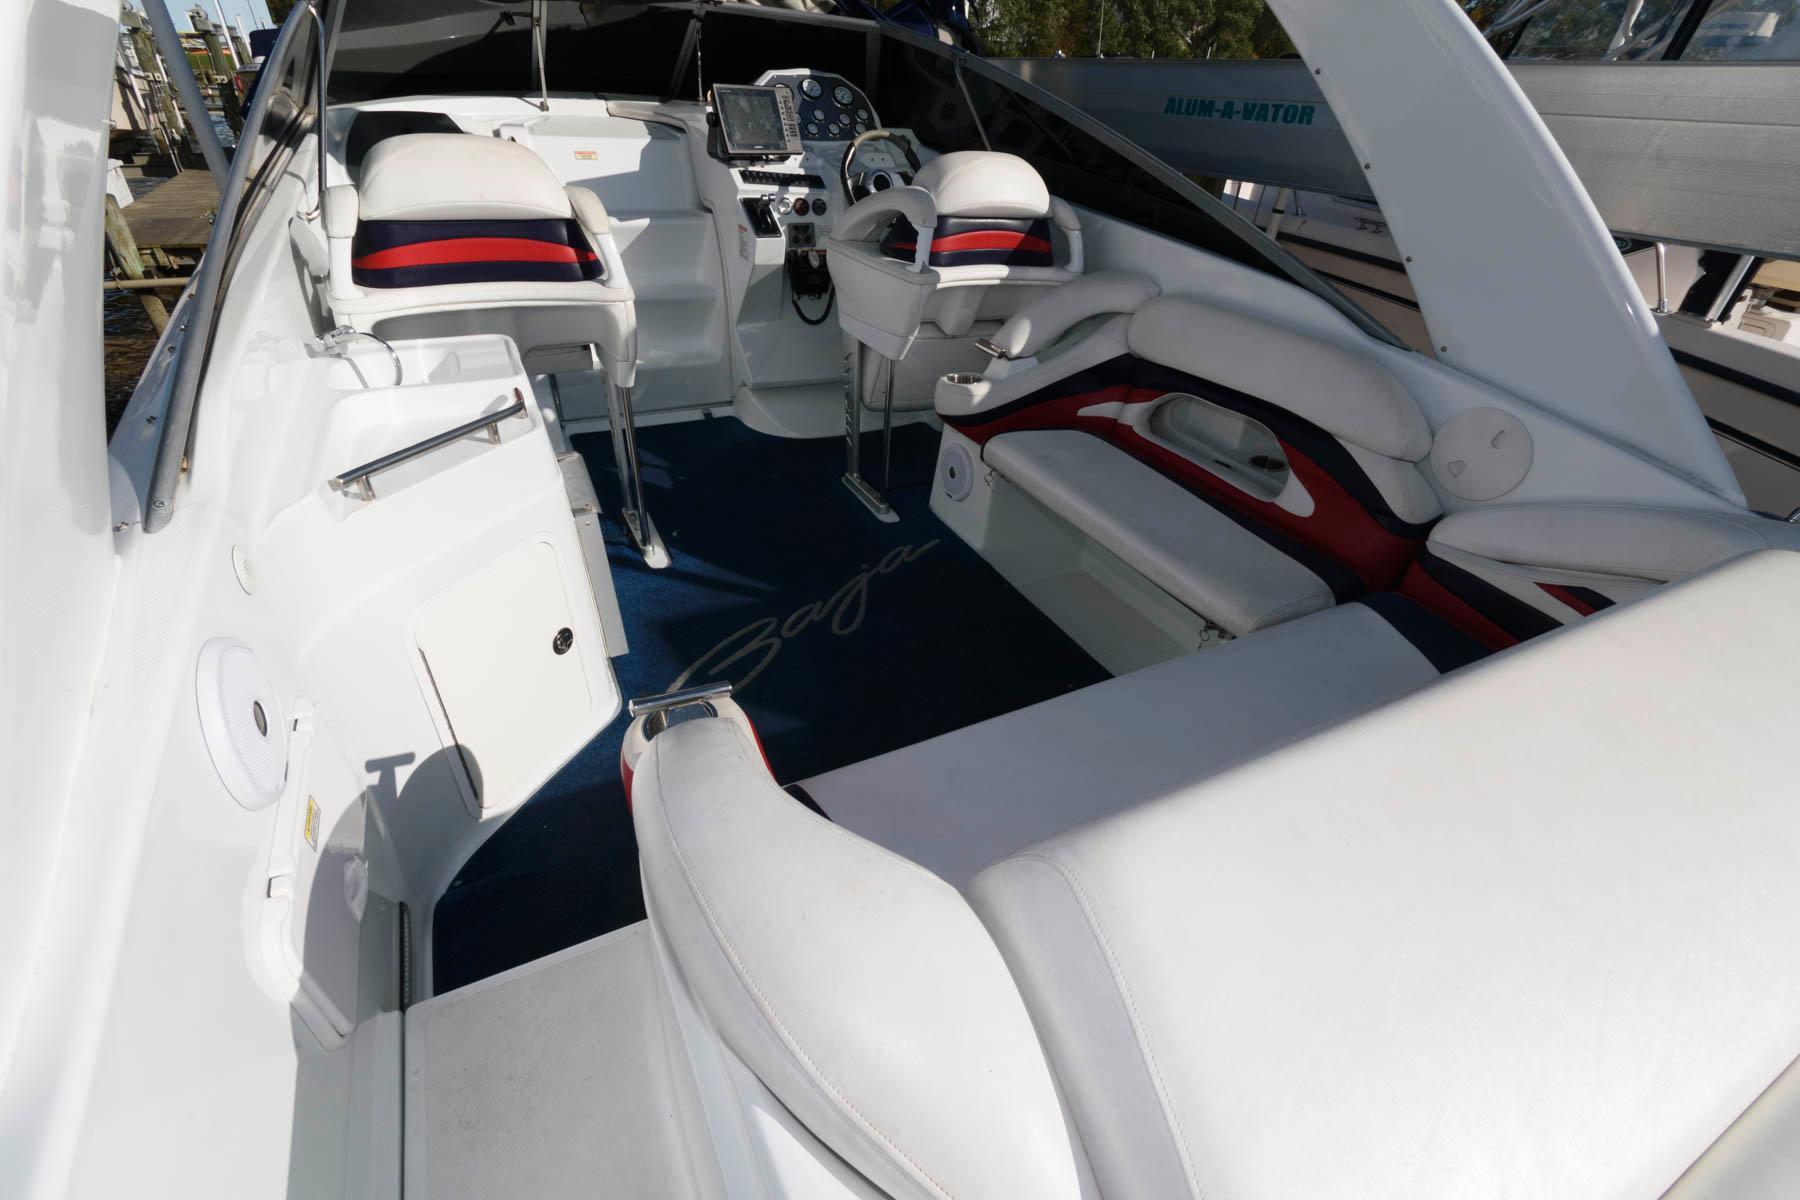 M 5824 JB Knot 10 Yacht Sales